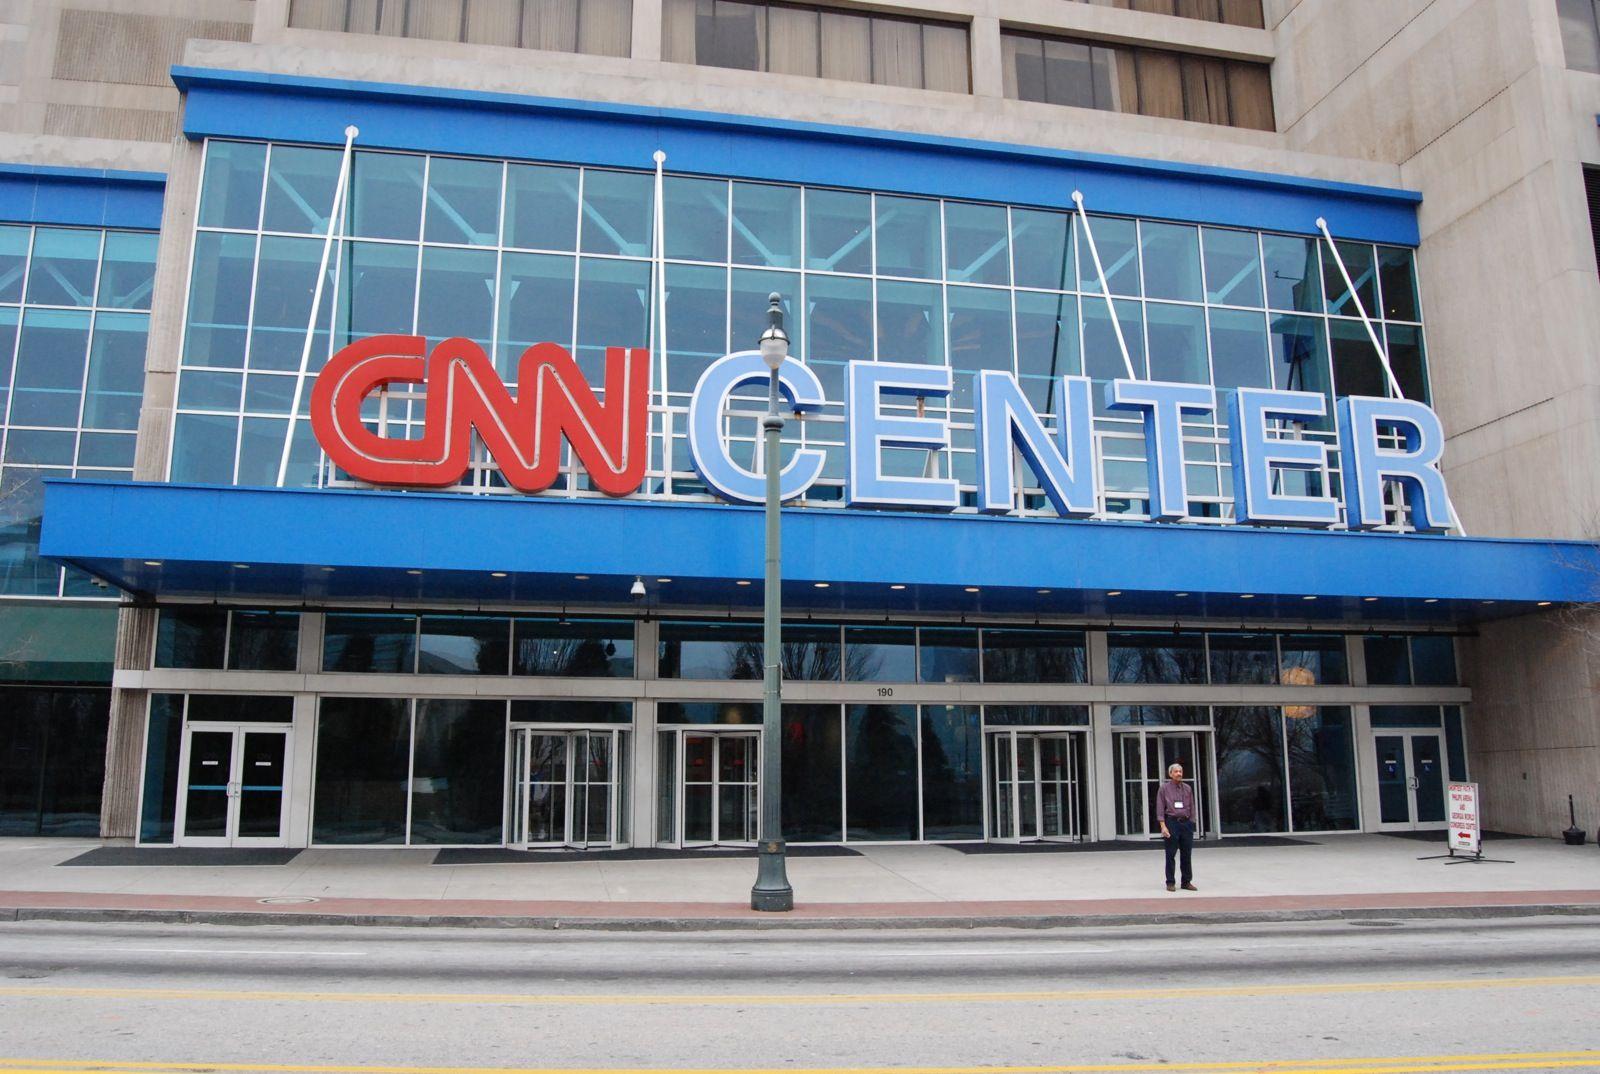 Visit the CNN Ce...Cnn